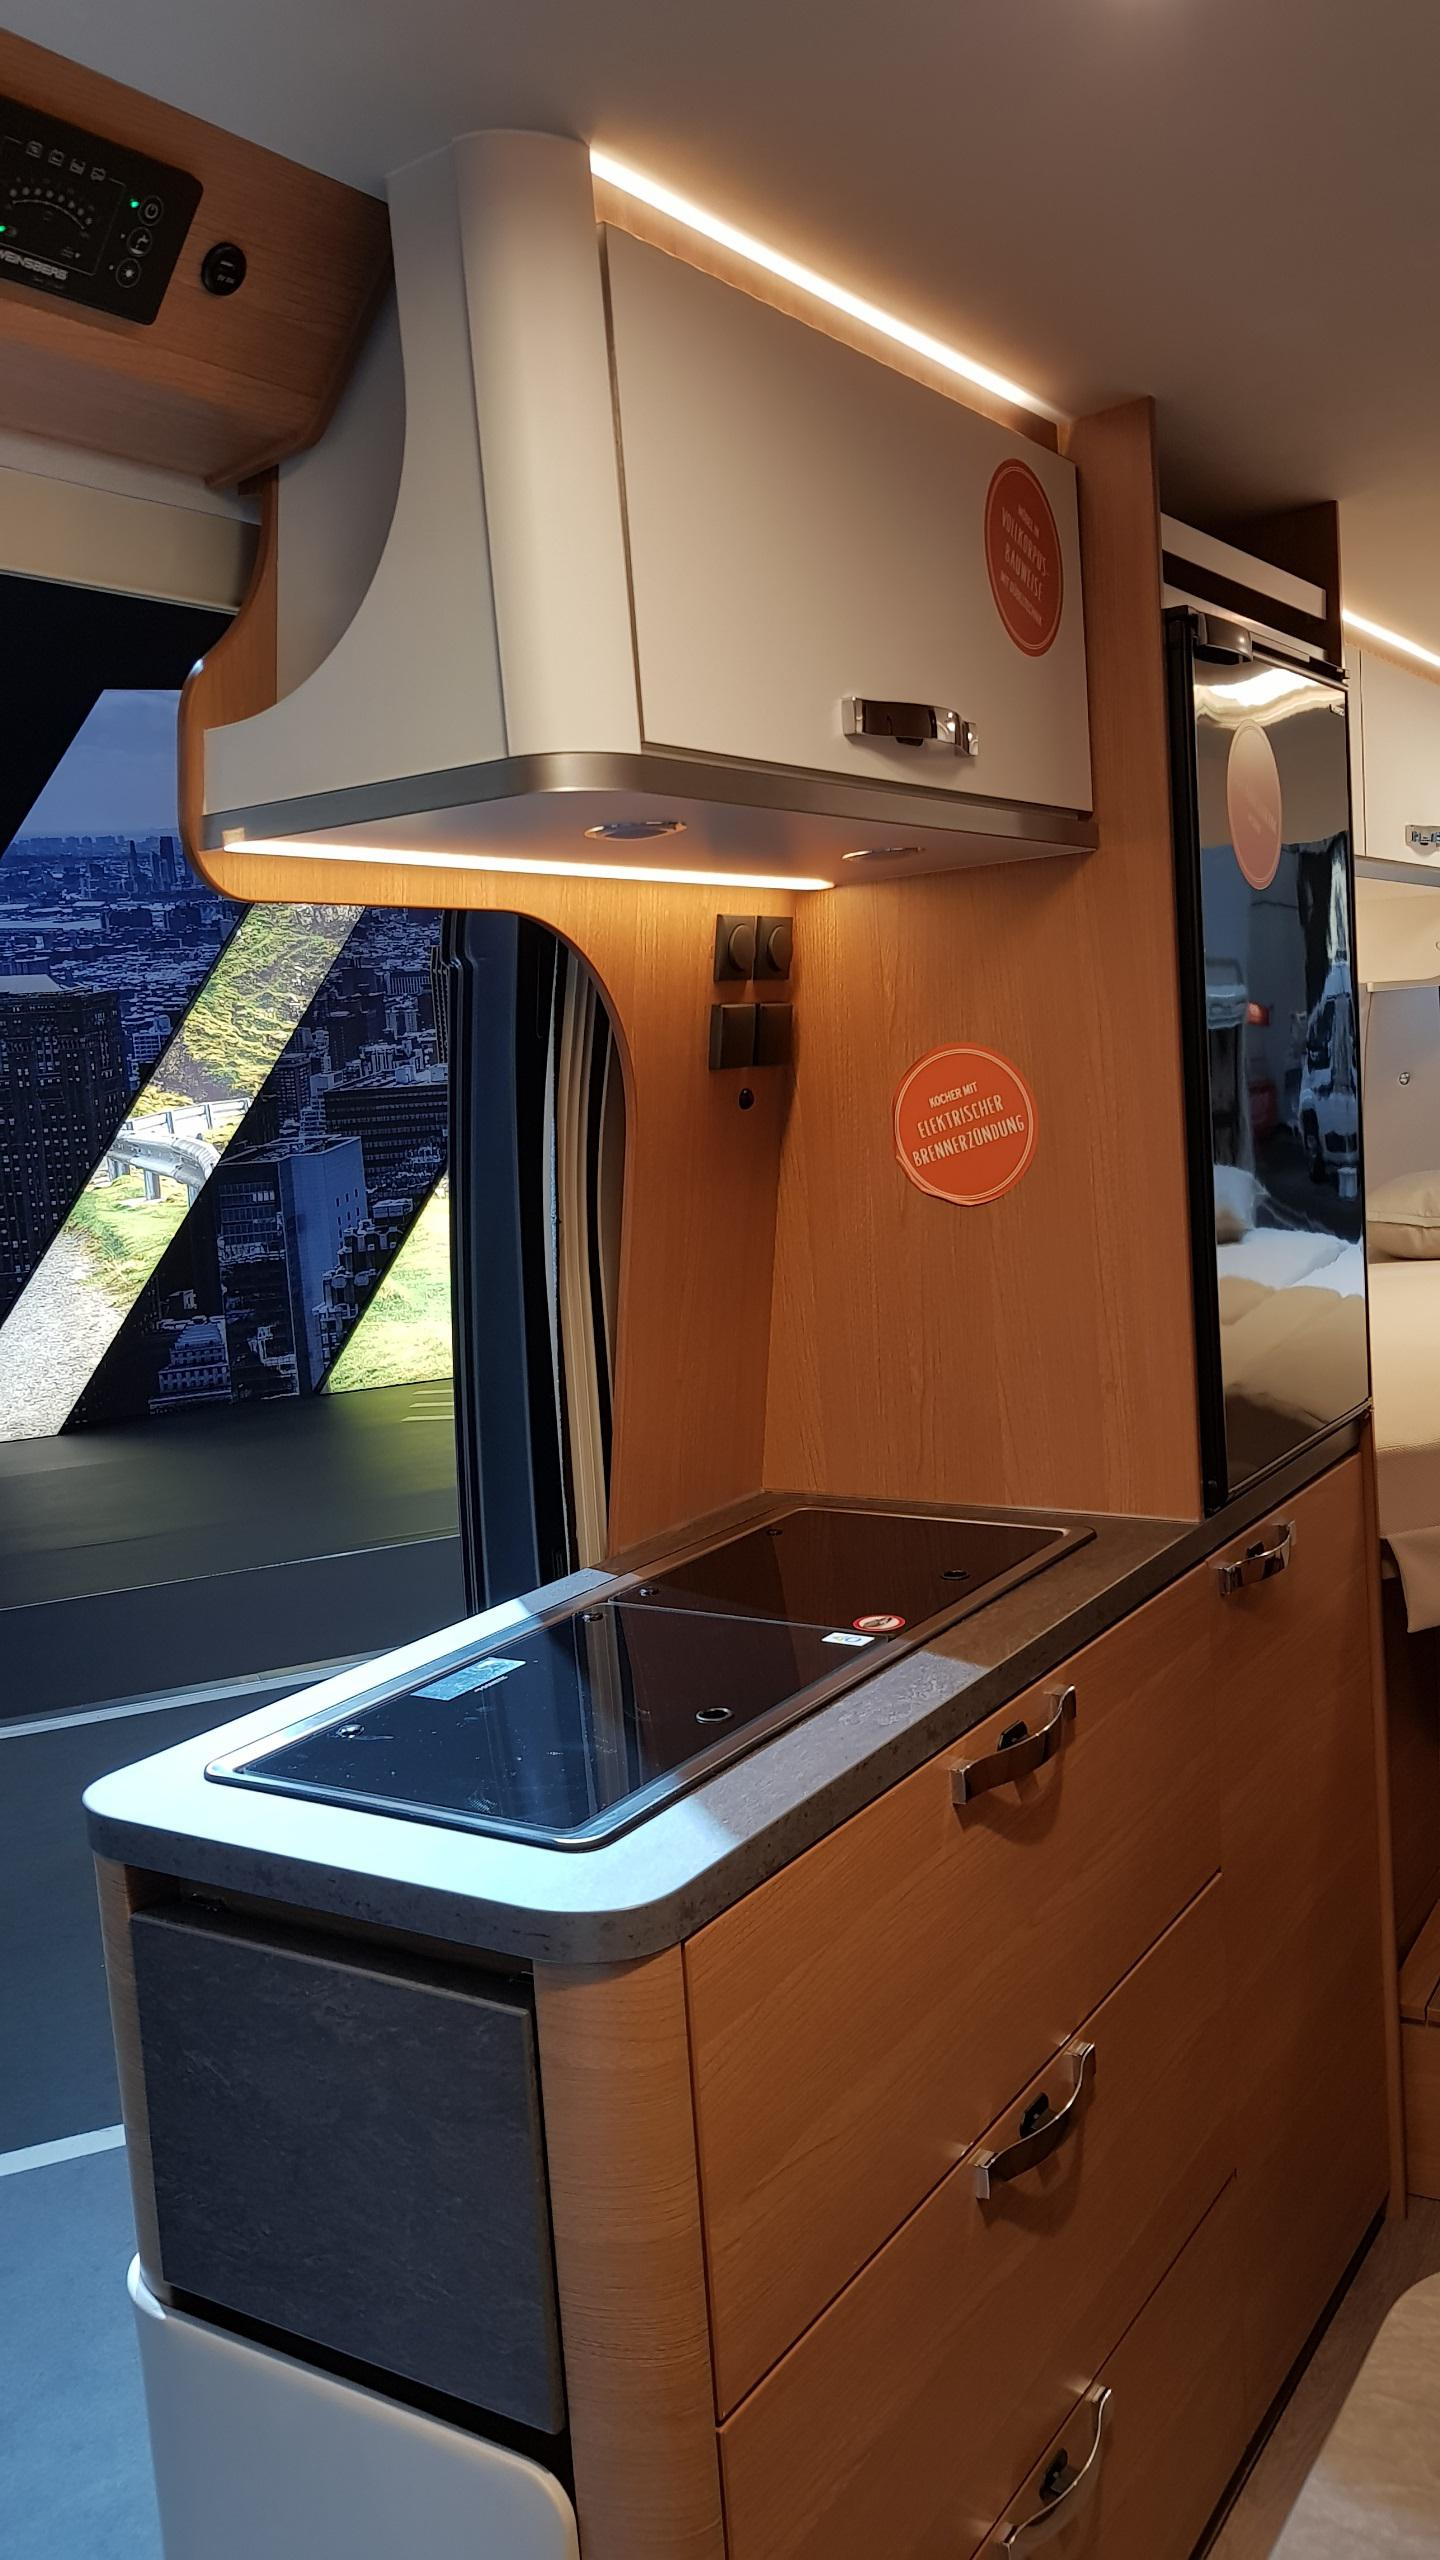 Verhuur Buscamper Lengte bedden 6,36 Lang Weinsberg-Caratour 630ME Type 3